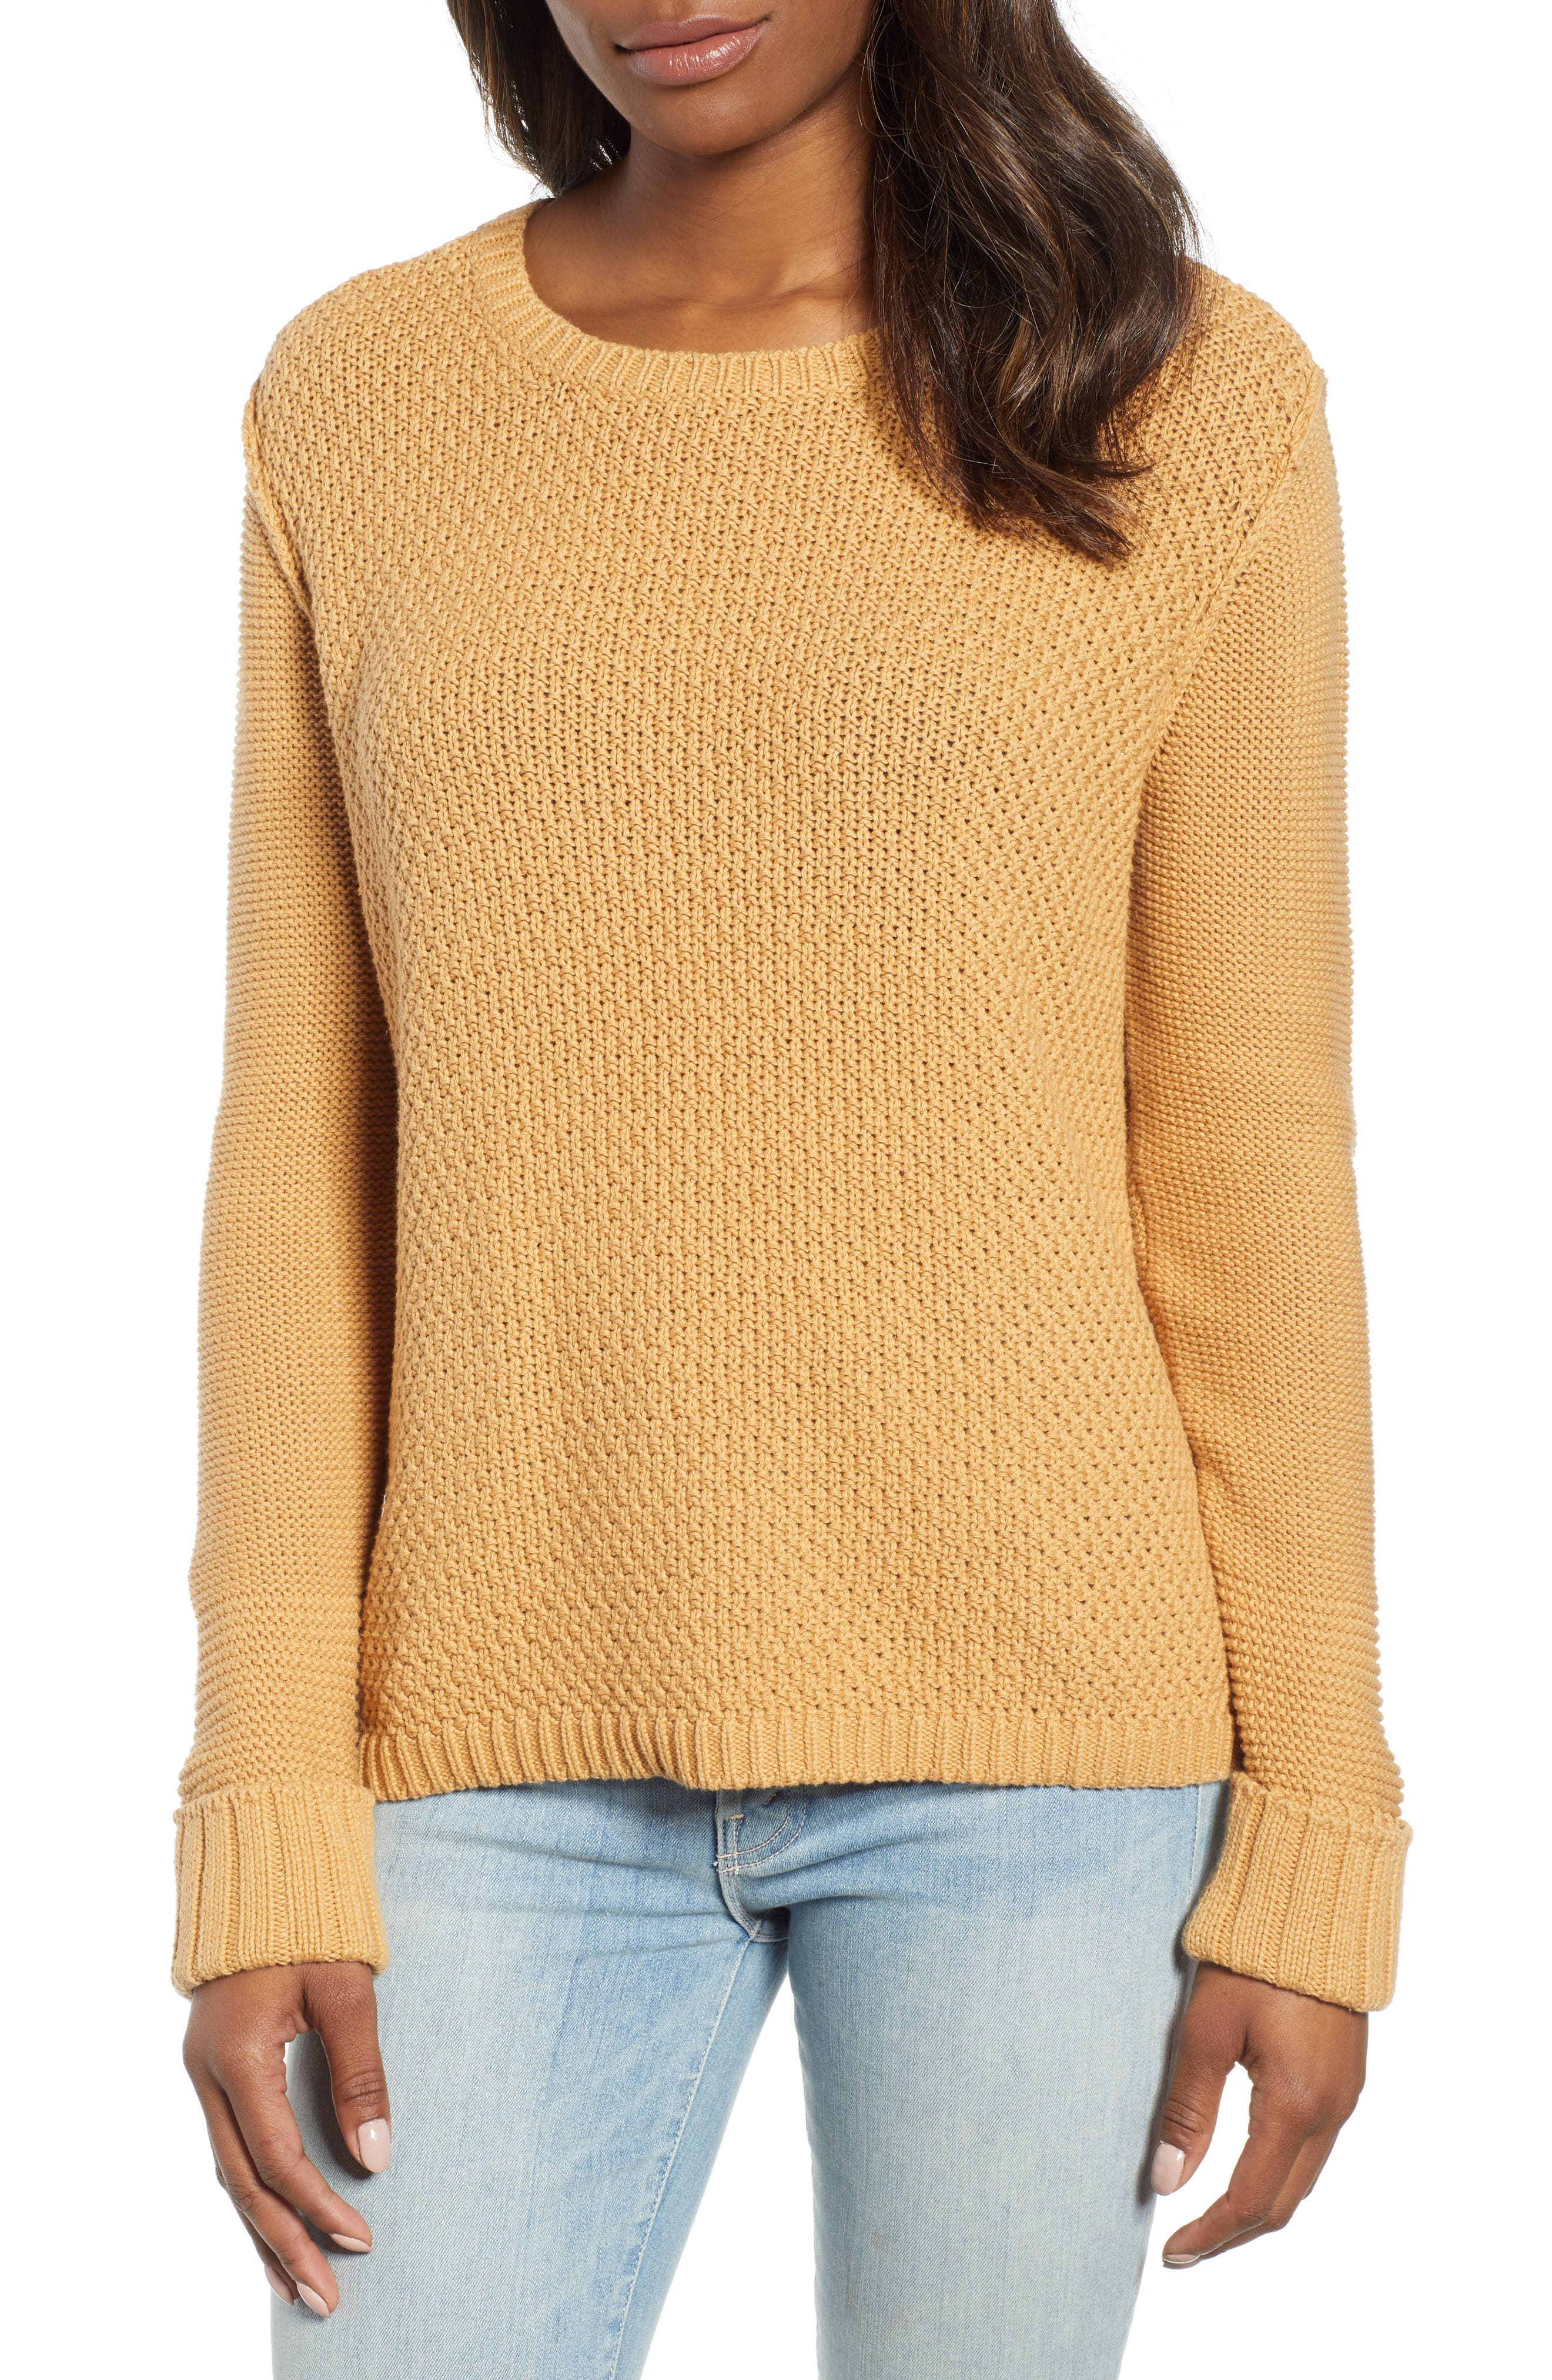 CASLON<SUP>®</SUP>, Mixed Stitch Sweater, Main thumbnail 1, color, TAN CINNAMON